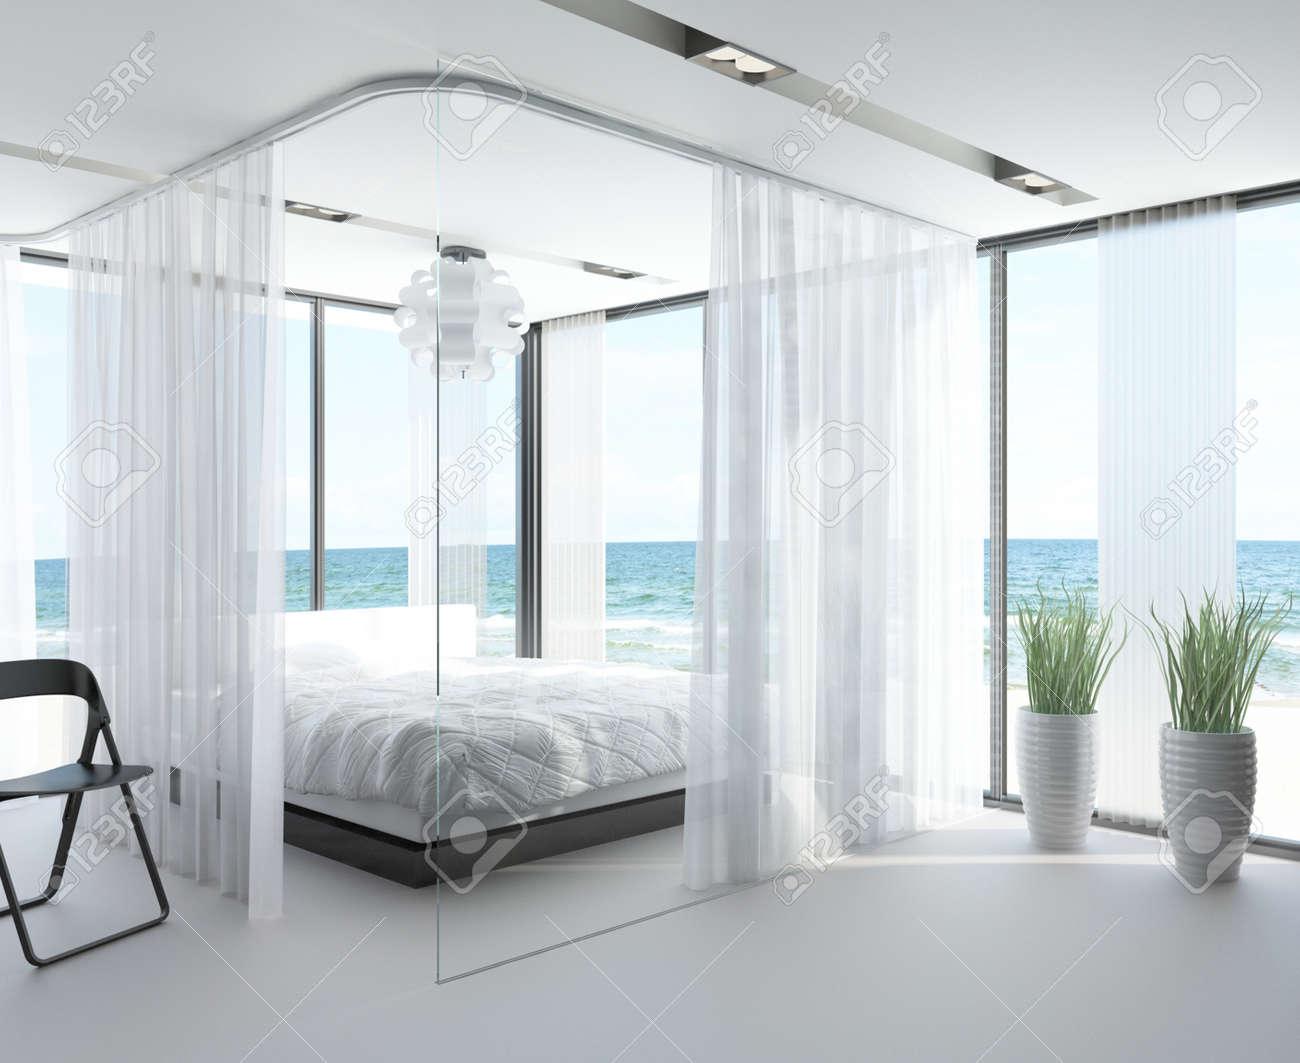 chambre moderne design int rieur moderne de chambre coucher design avec vue marin - Belle Chambre Moderne